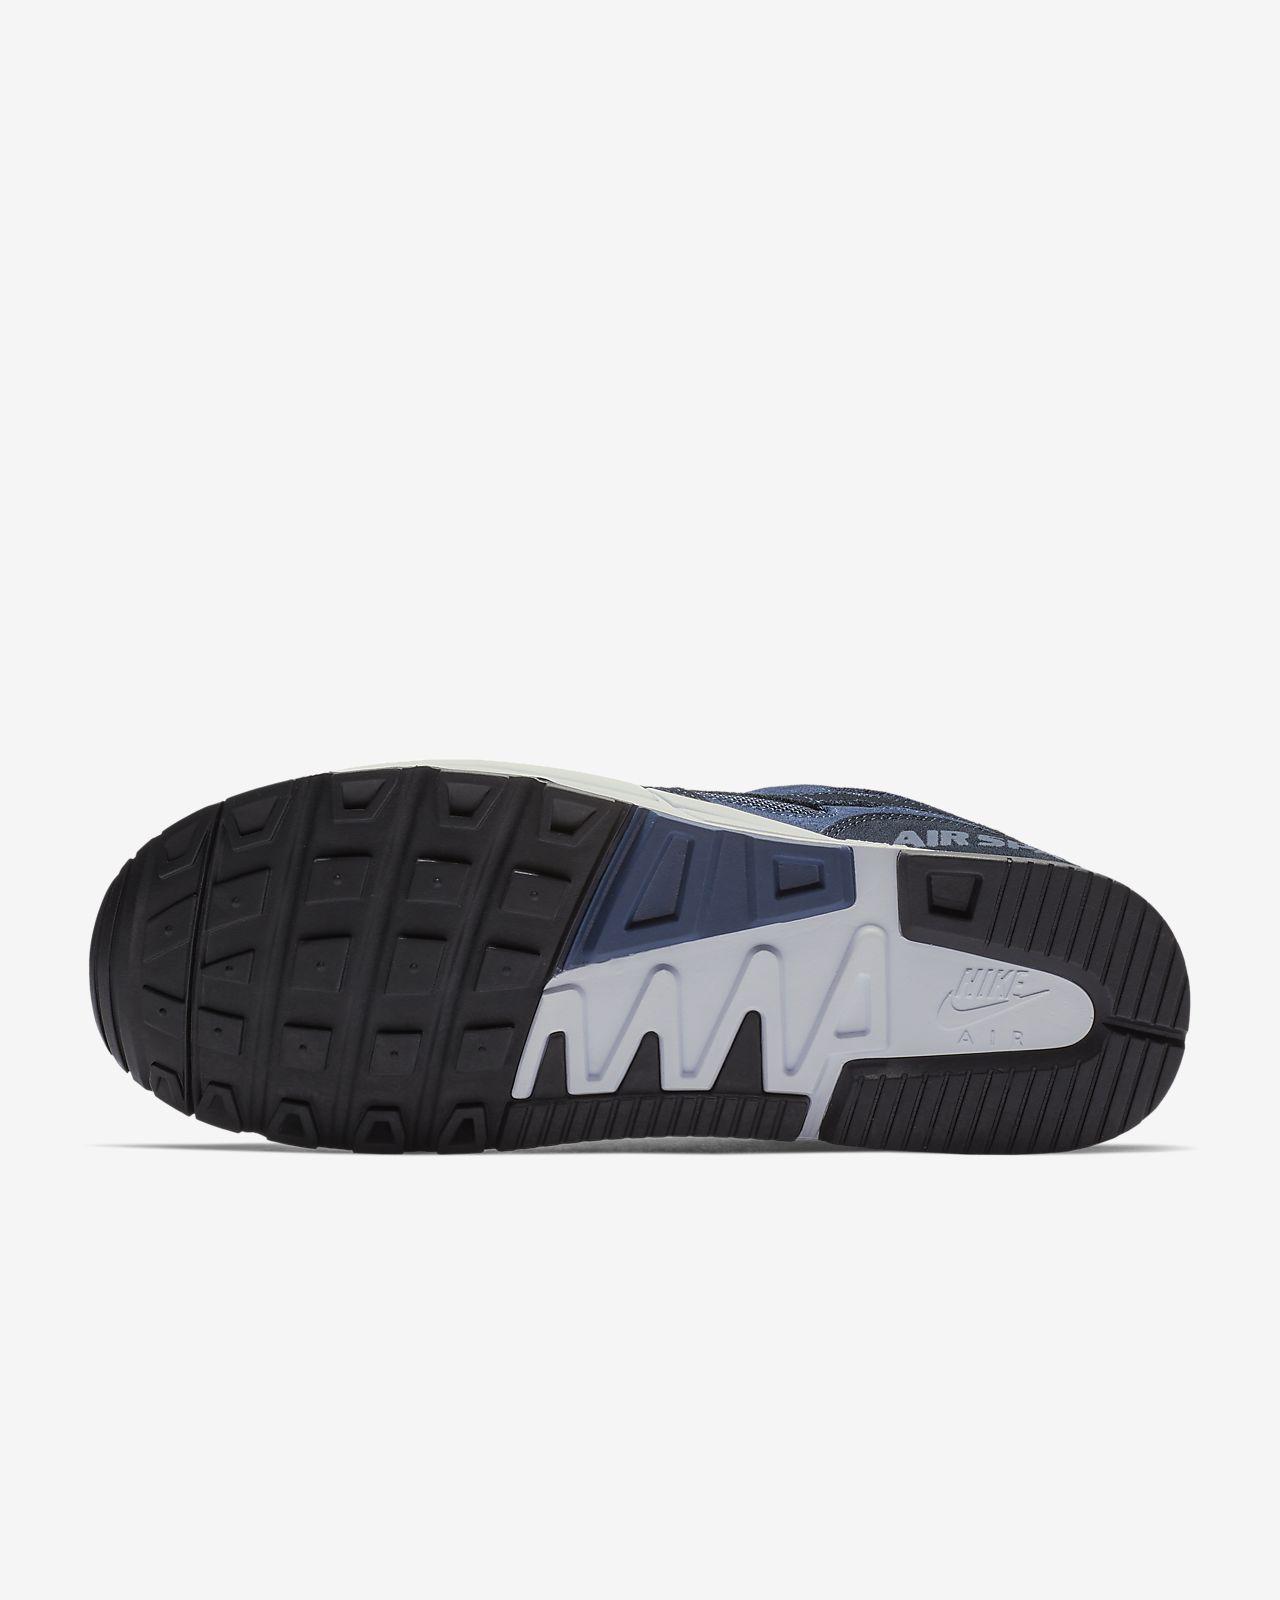 release date: cadf0 050cc ... Sko Nike Air Span II SE för män